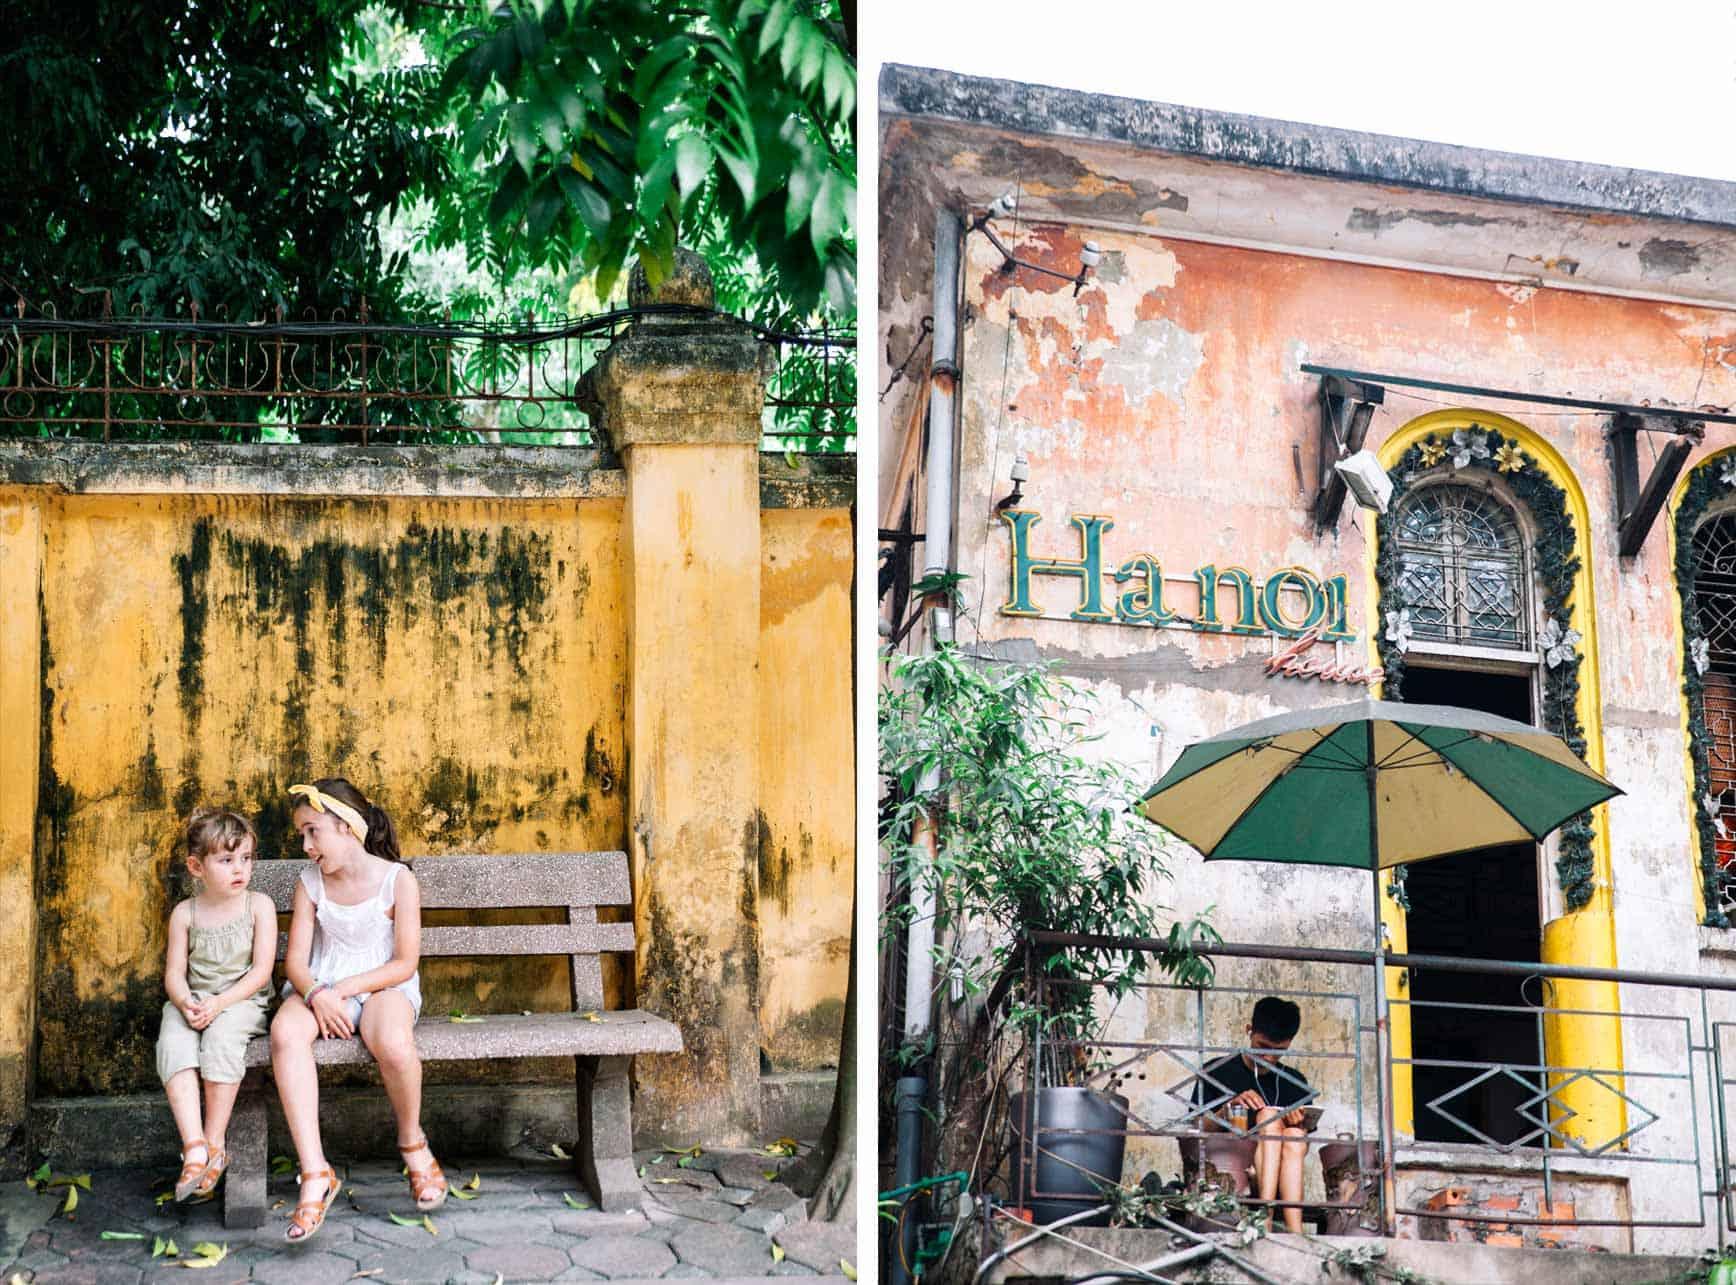 Hanoi_4